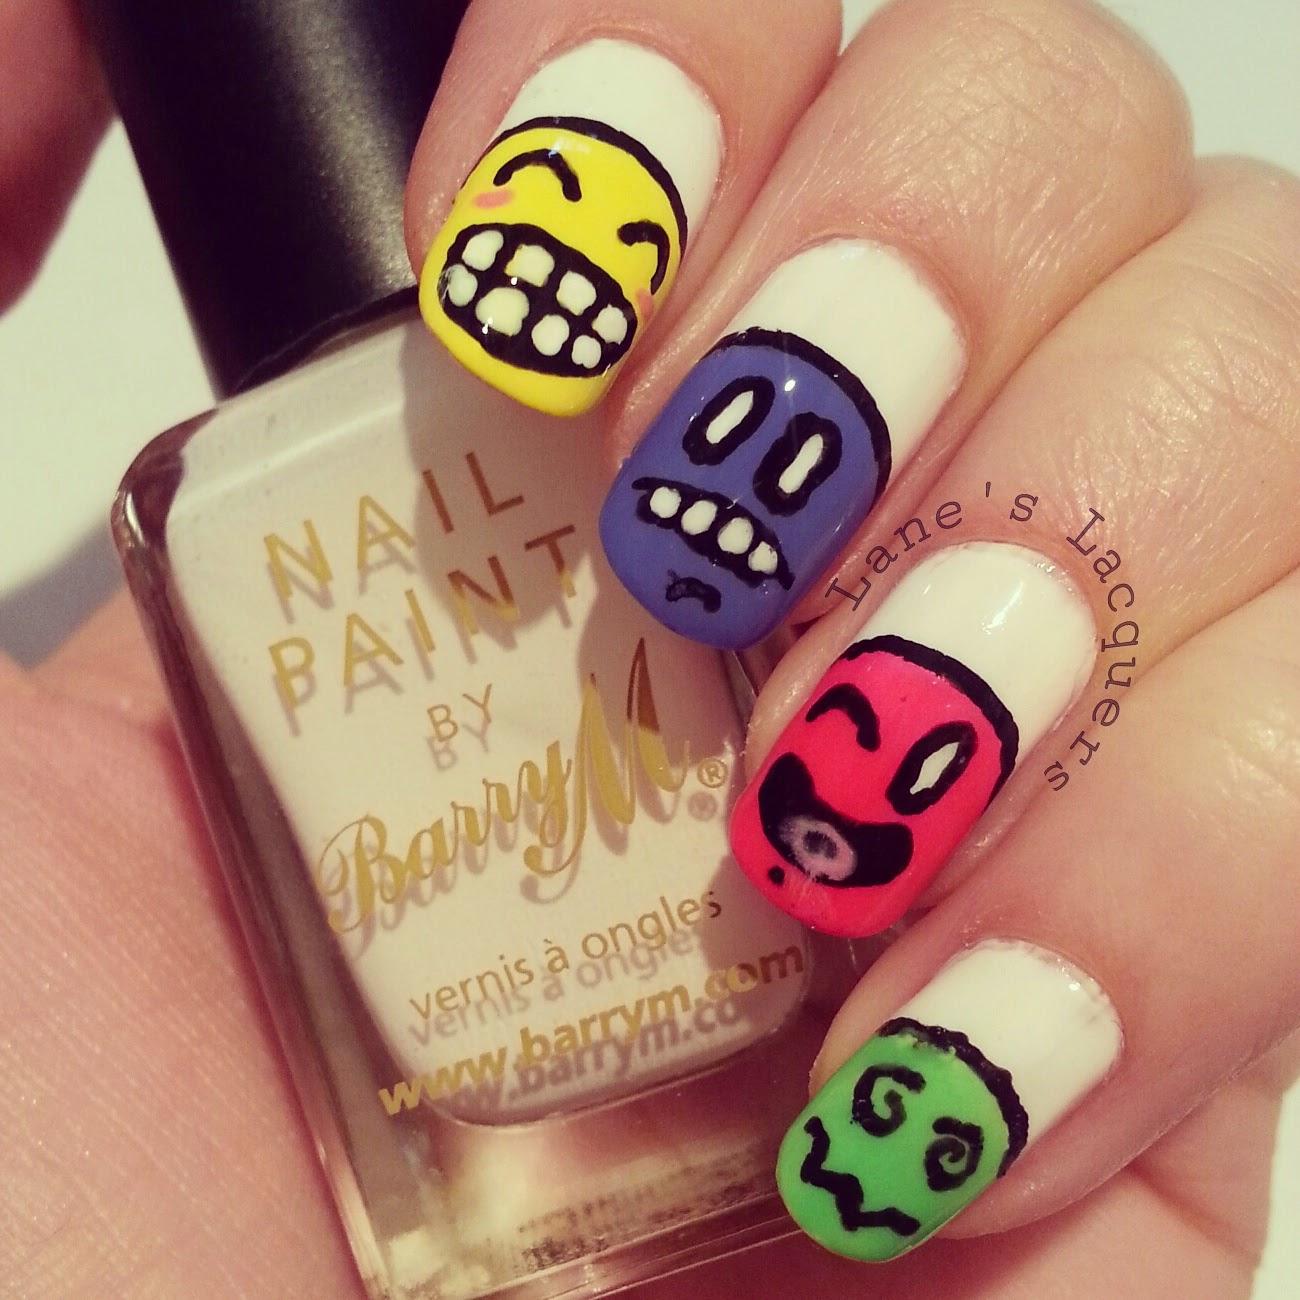 zukie-art-barry-m-freehand-nail-art (2)